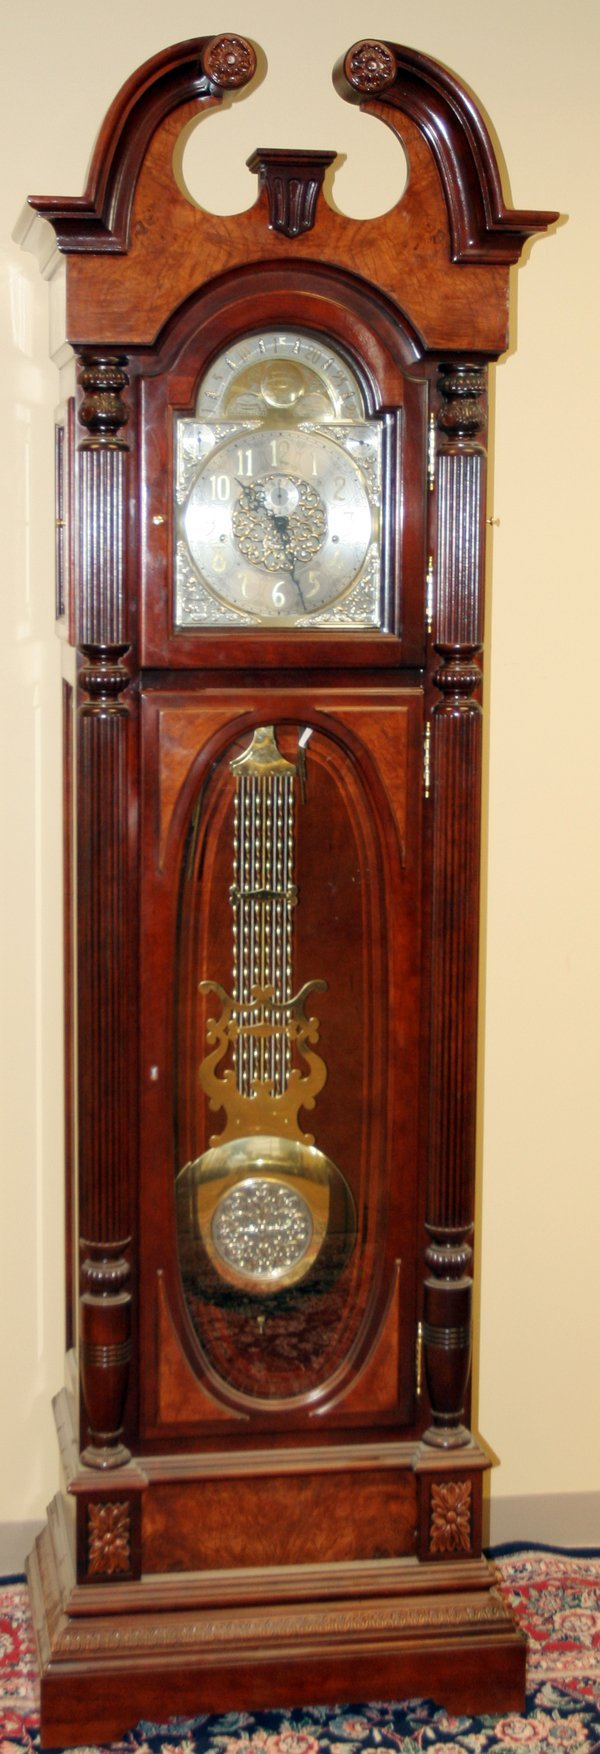 020025: HOWARD MILLER MAHOGANY GRANDFATHER CLOCK